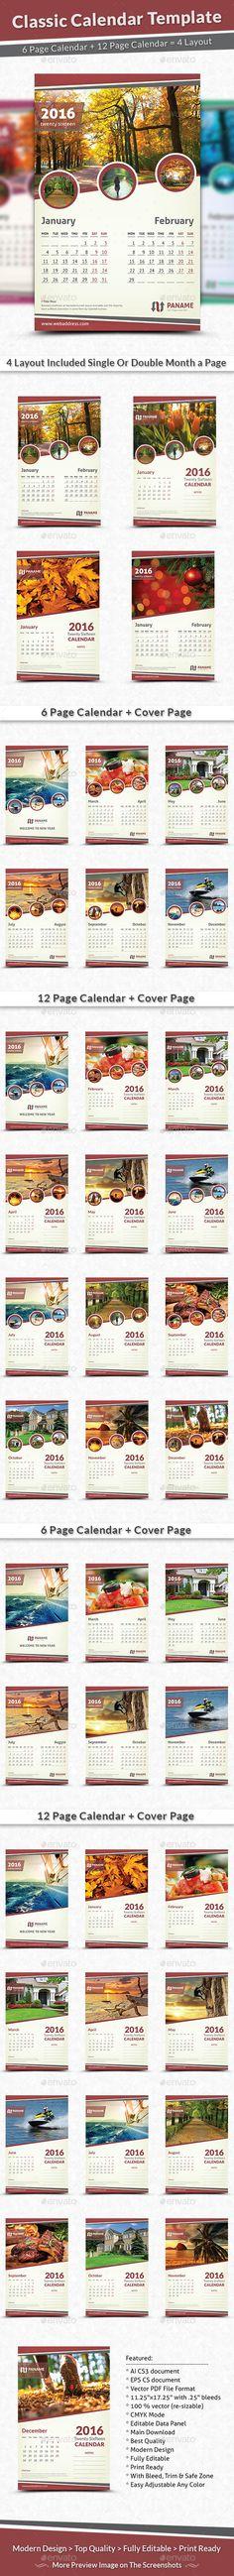 Desk Calendar 2017 Template InDesign INDD | Calendar Templates ...